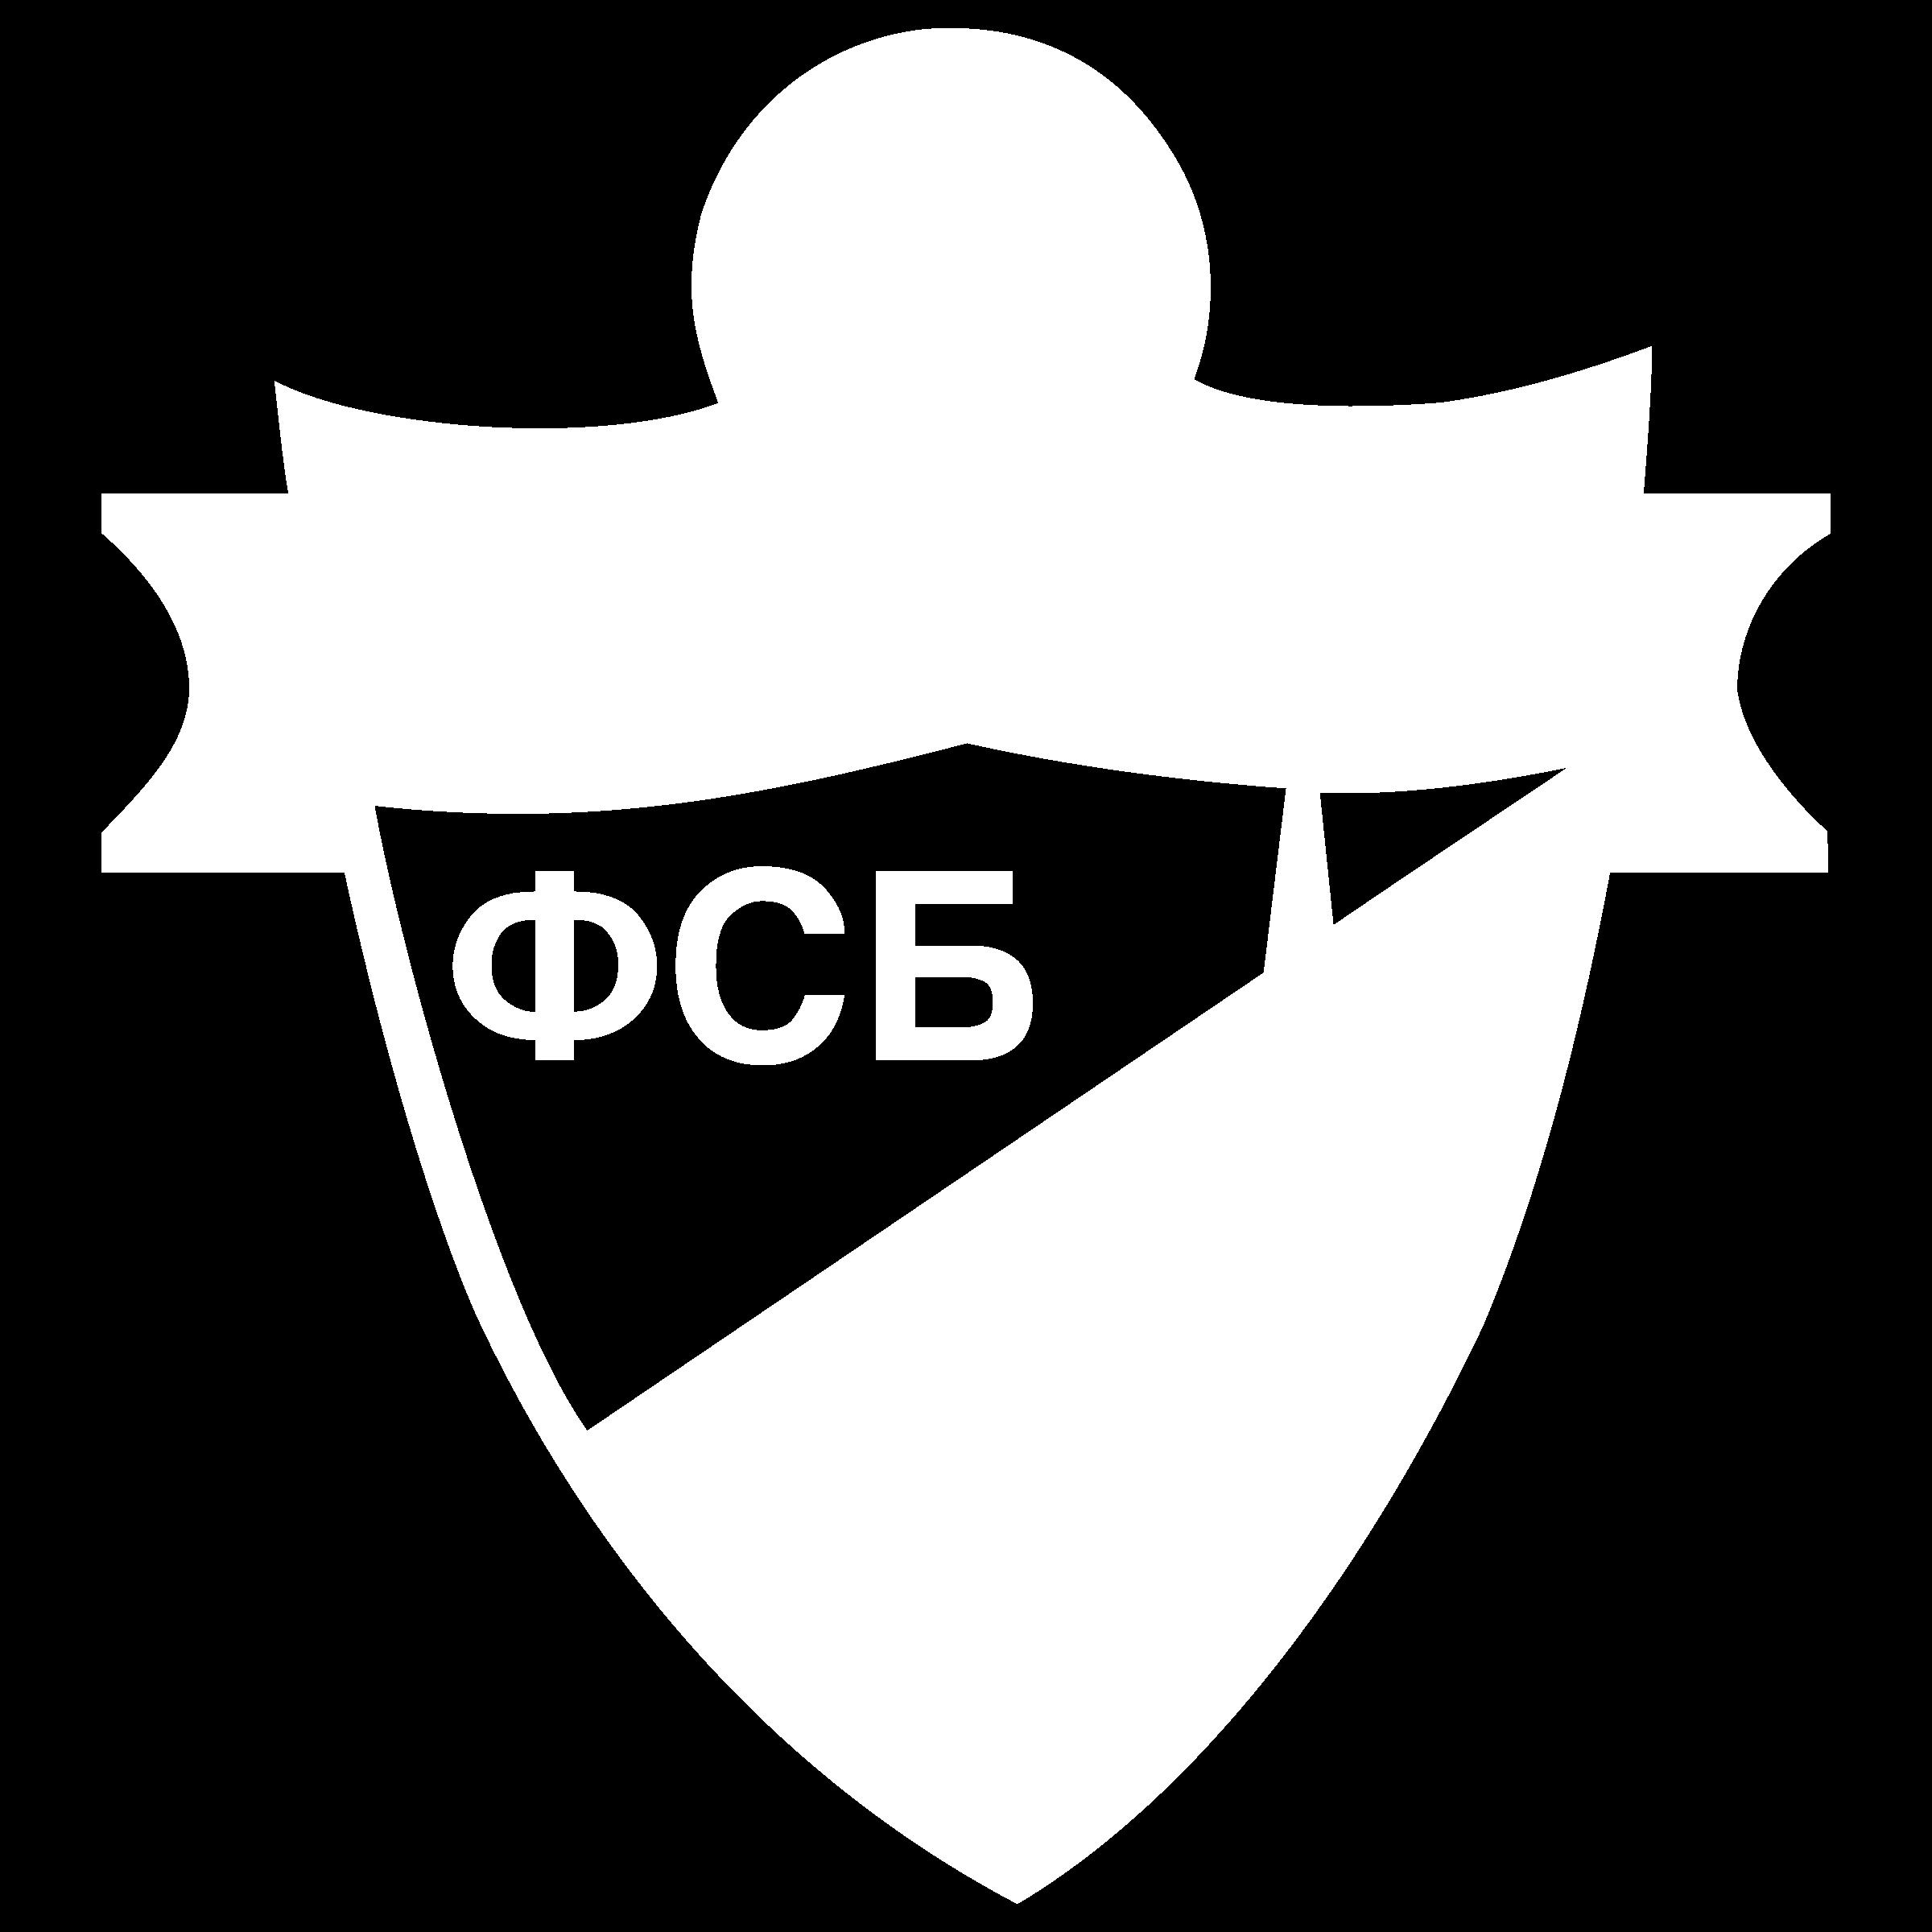 FSB Logo PNG Transparent & SVG Vector.